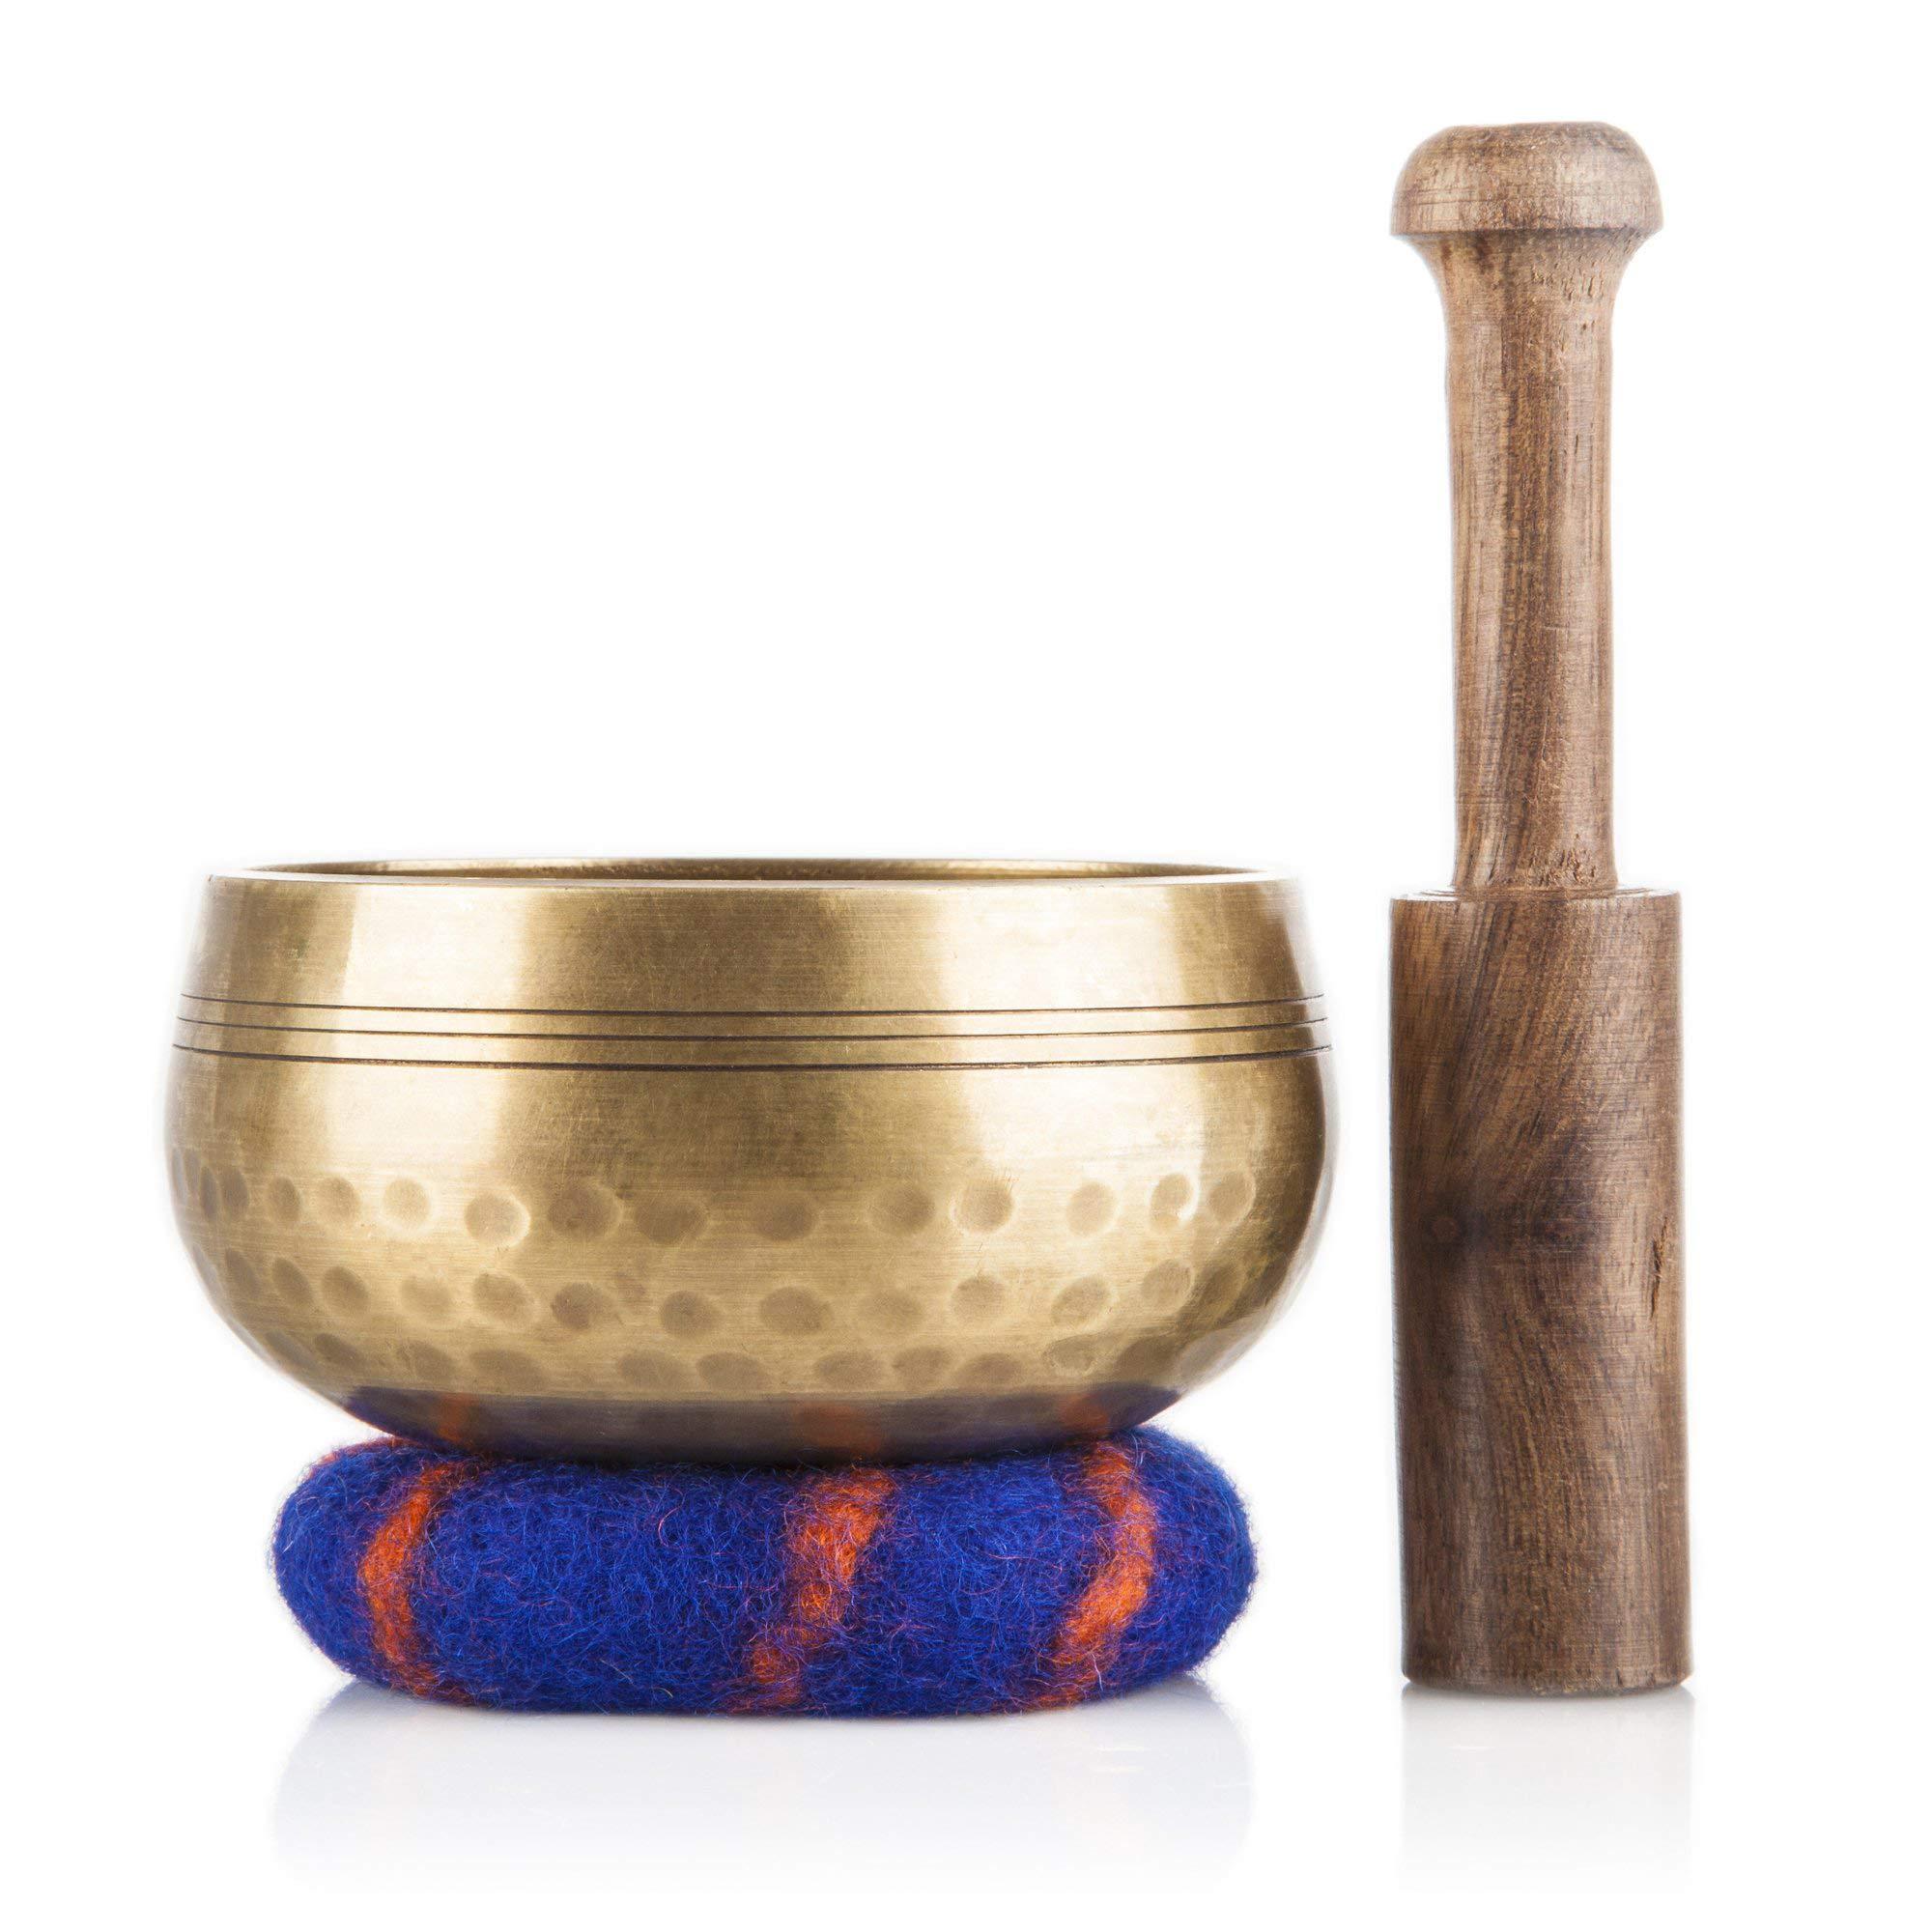 Tibetan Singing Bowl Set Handcrafted